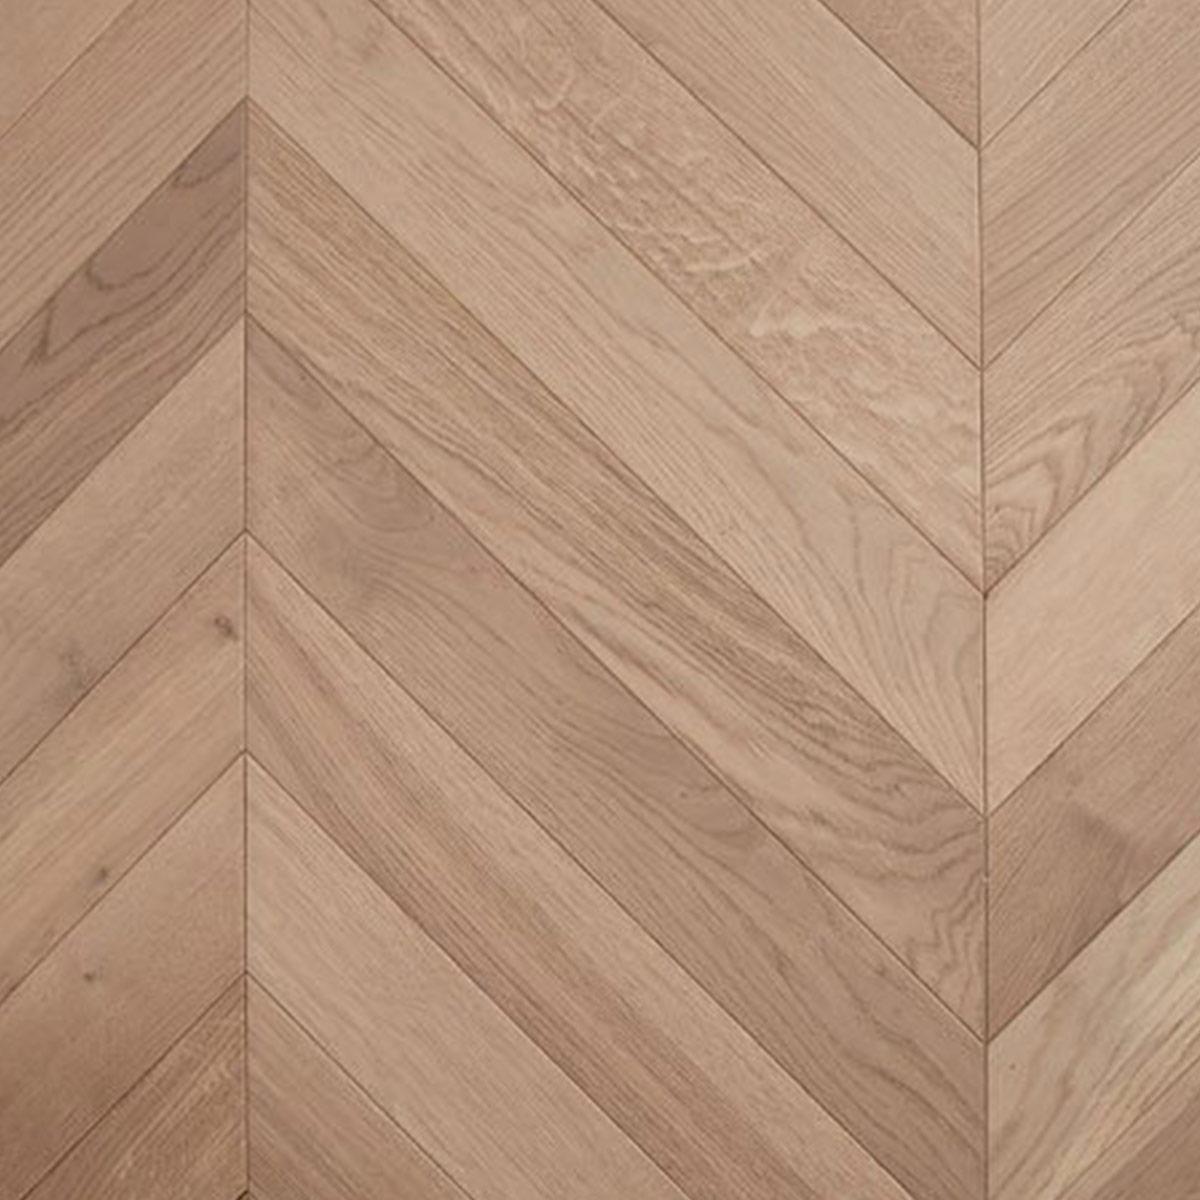 De Marque Oak Timber Flooring - Chevron - Champagne - Stone3 Brisbane